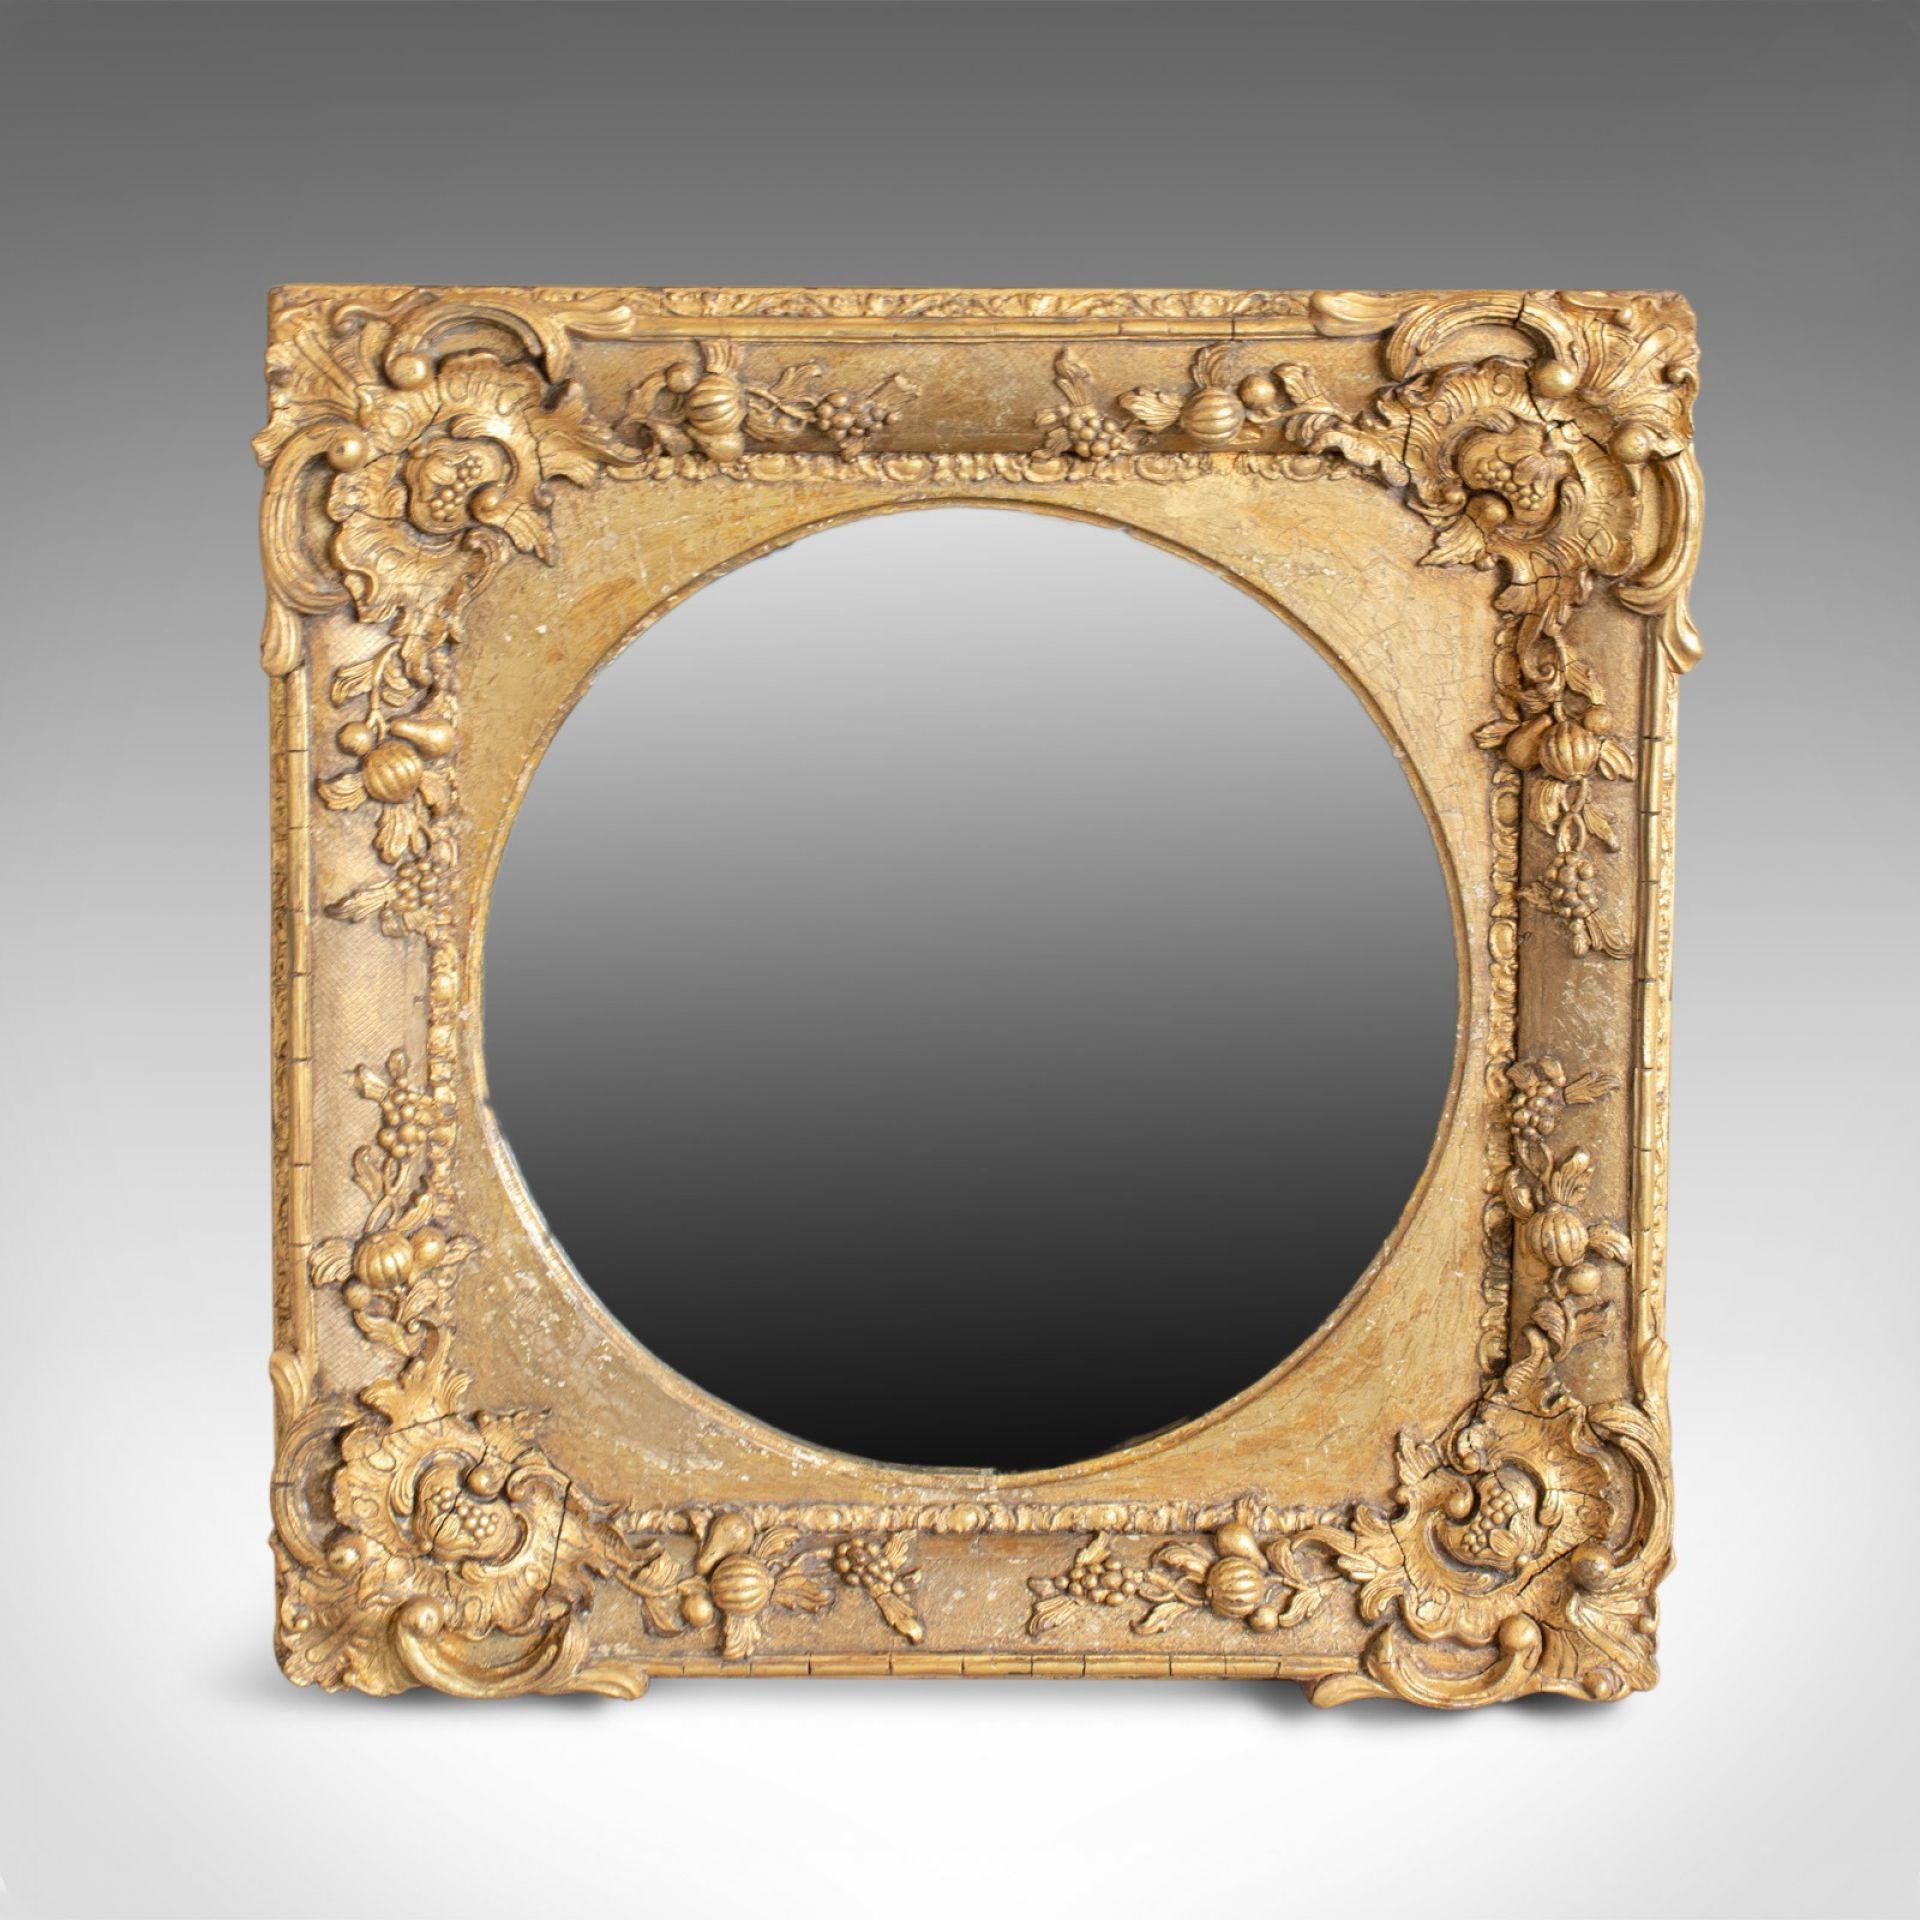 Antique Wall Mirror, English, Victorian, Gilt Gesso, Square, Circular Circa 1870